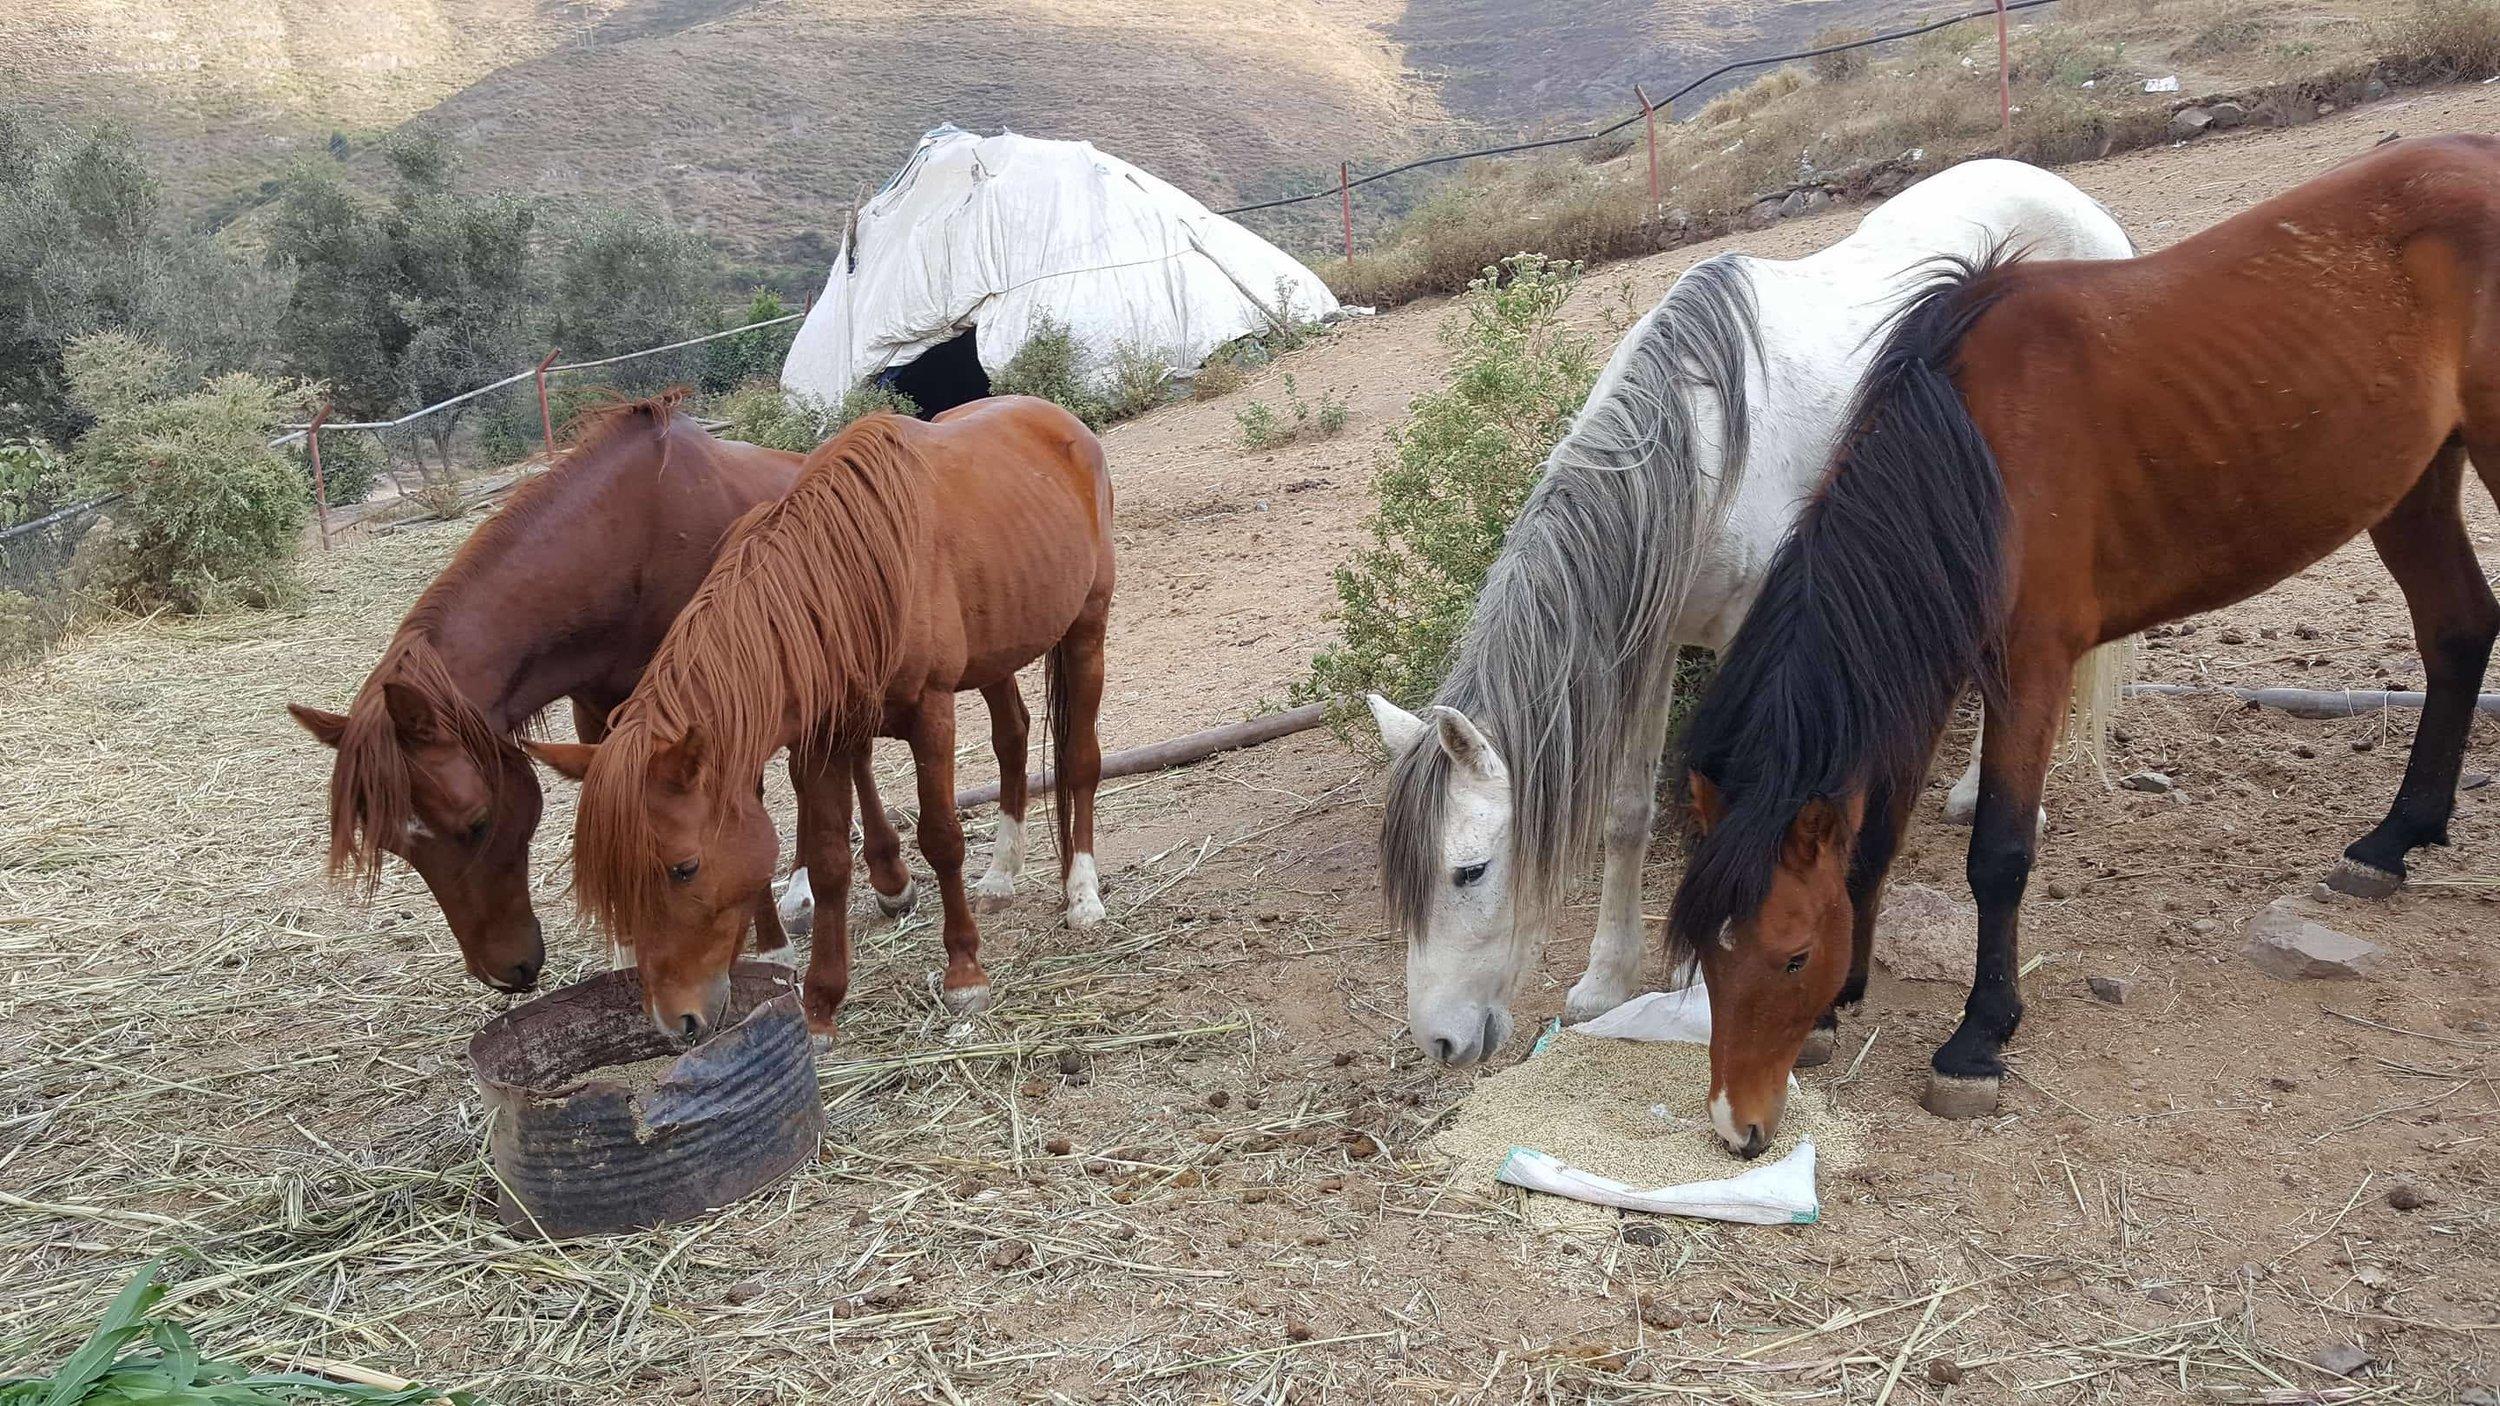 Ibb Zoo horses food at last OWAR AR supporting Salman coordinating 29 DEC 2017 .jpg